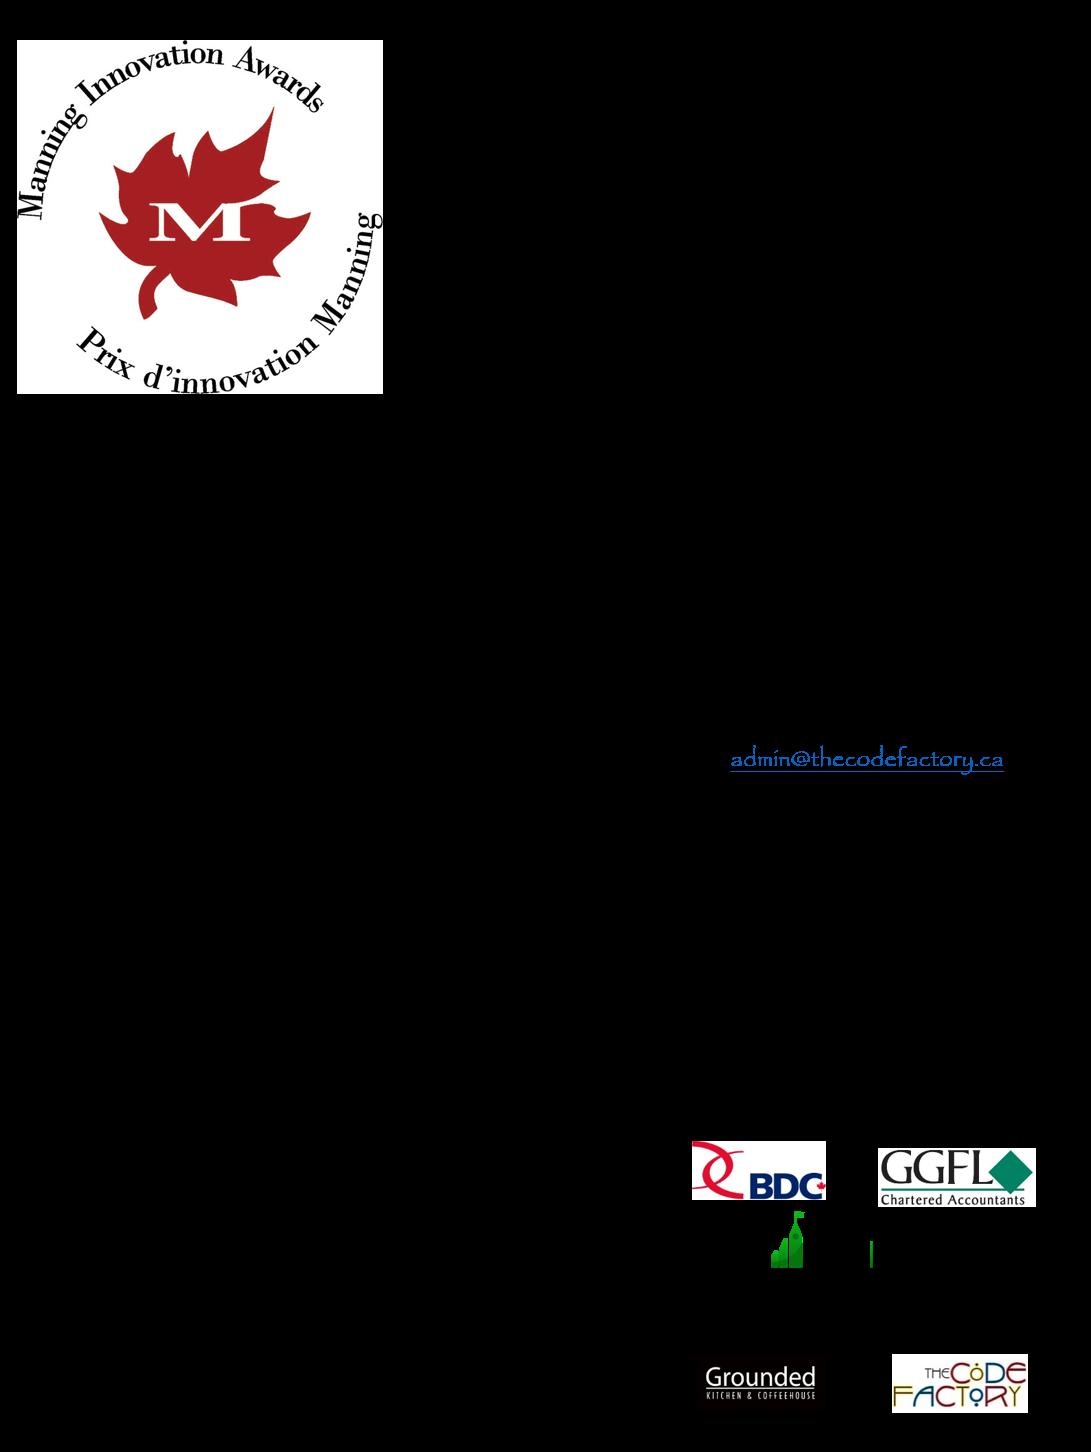 Ottawa Nominee Reception Invitation